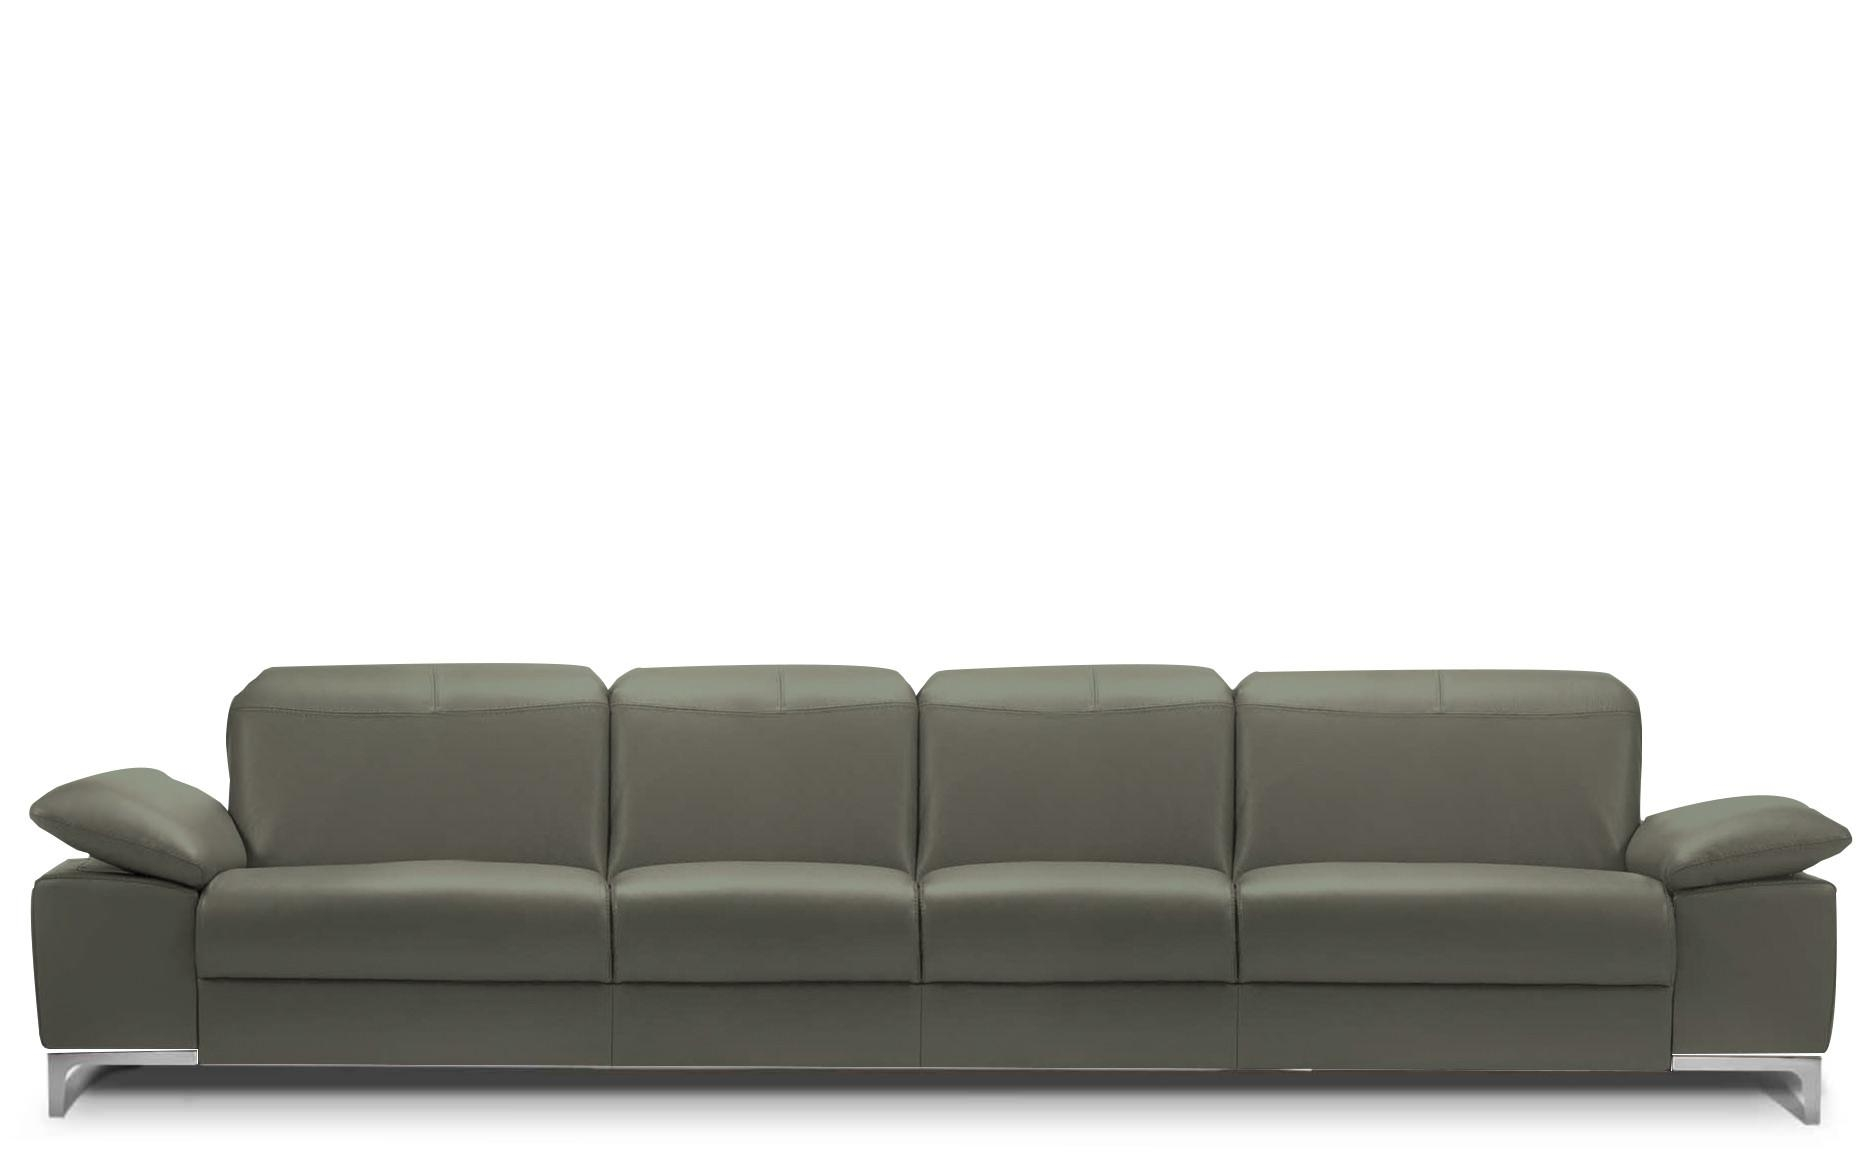 Rom Chronos 4 Seater Leather Sofa | Buy At Kontenta Throughout 4 Seat Leather Sofas (View 3 of 20)